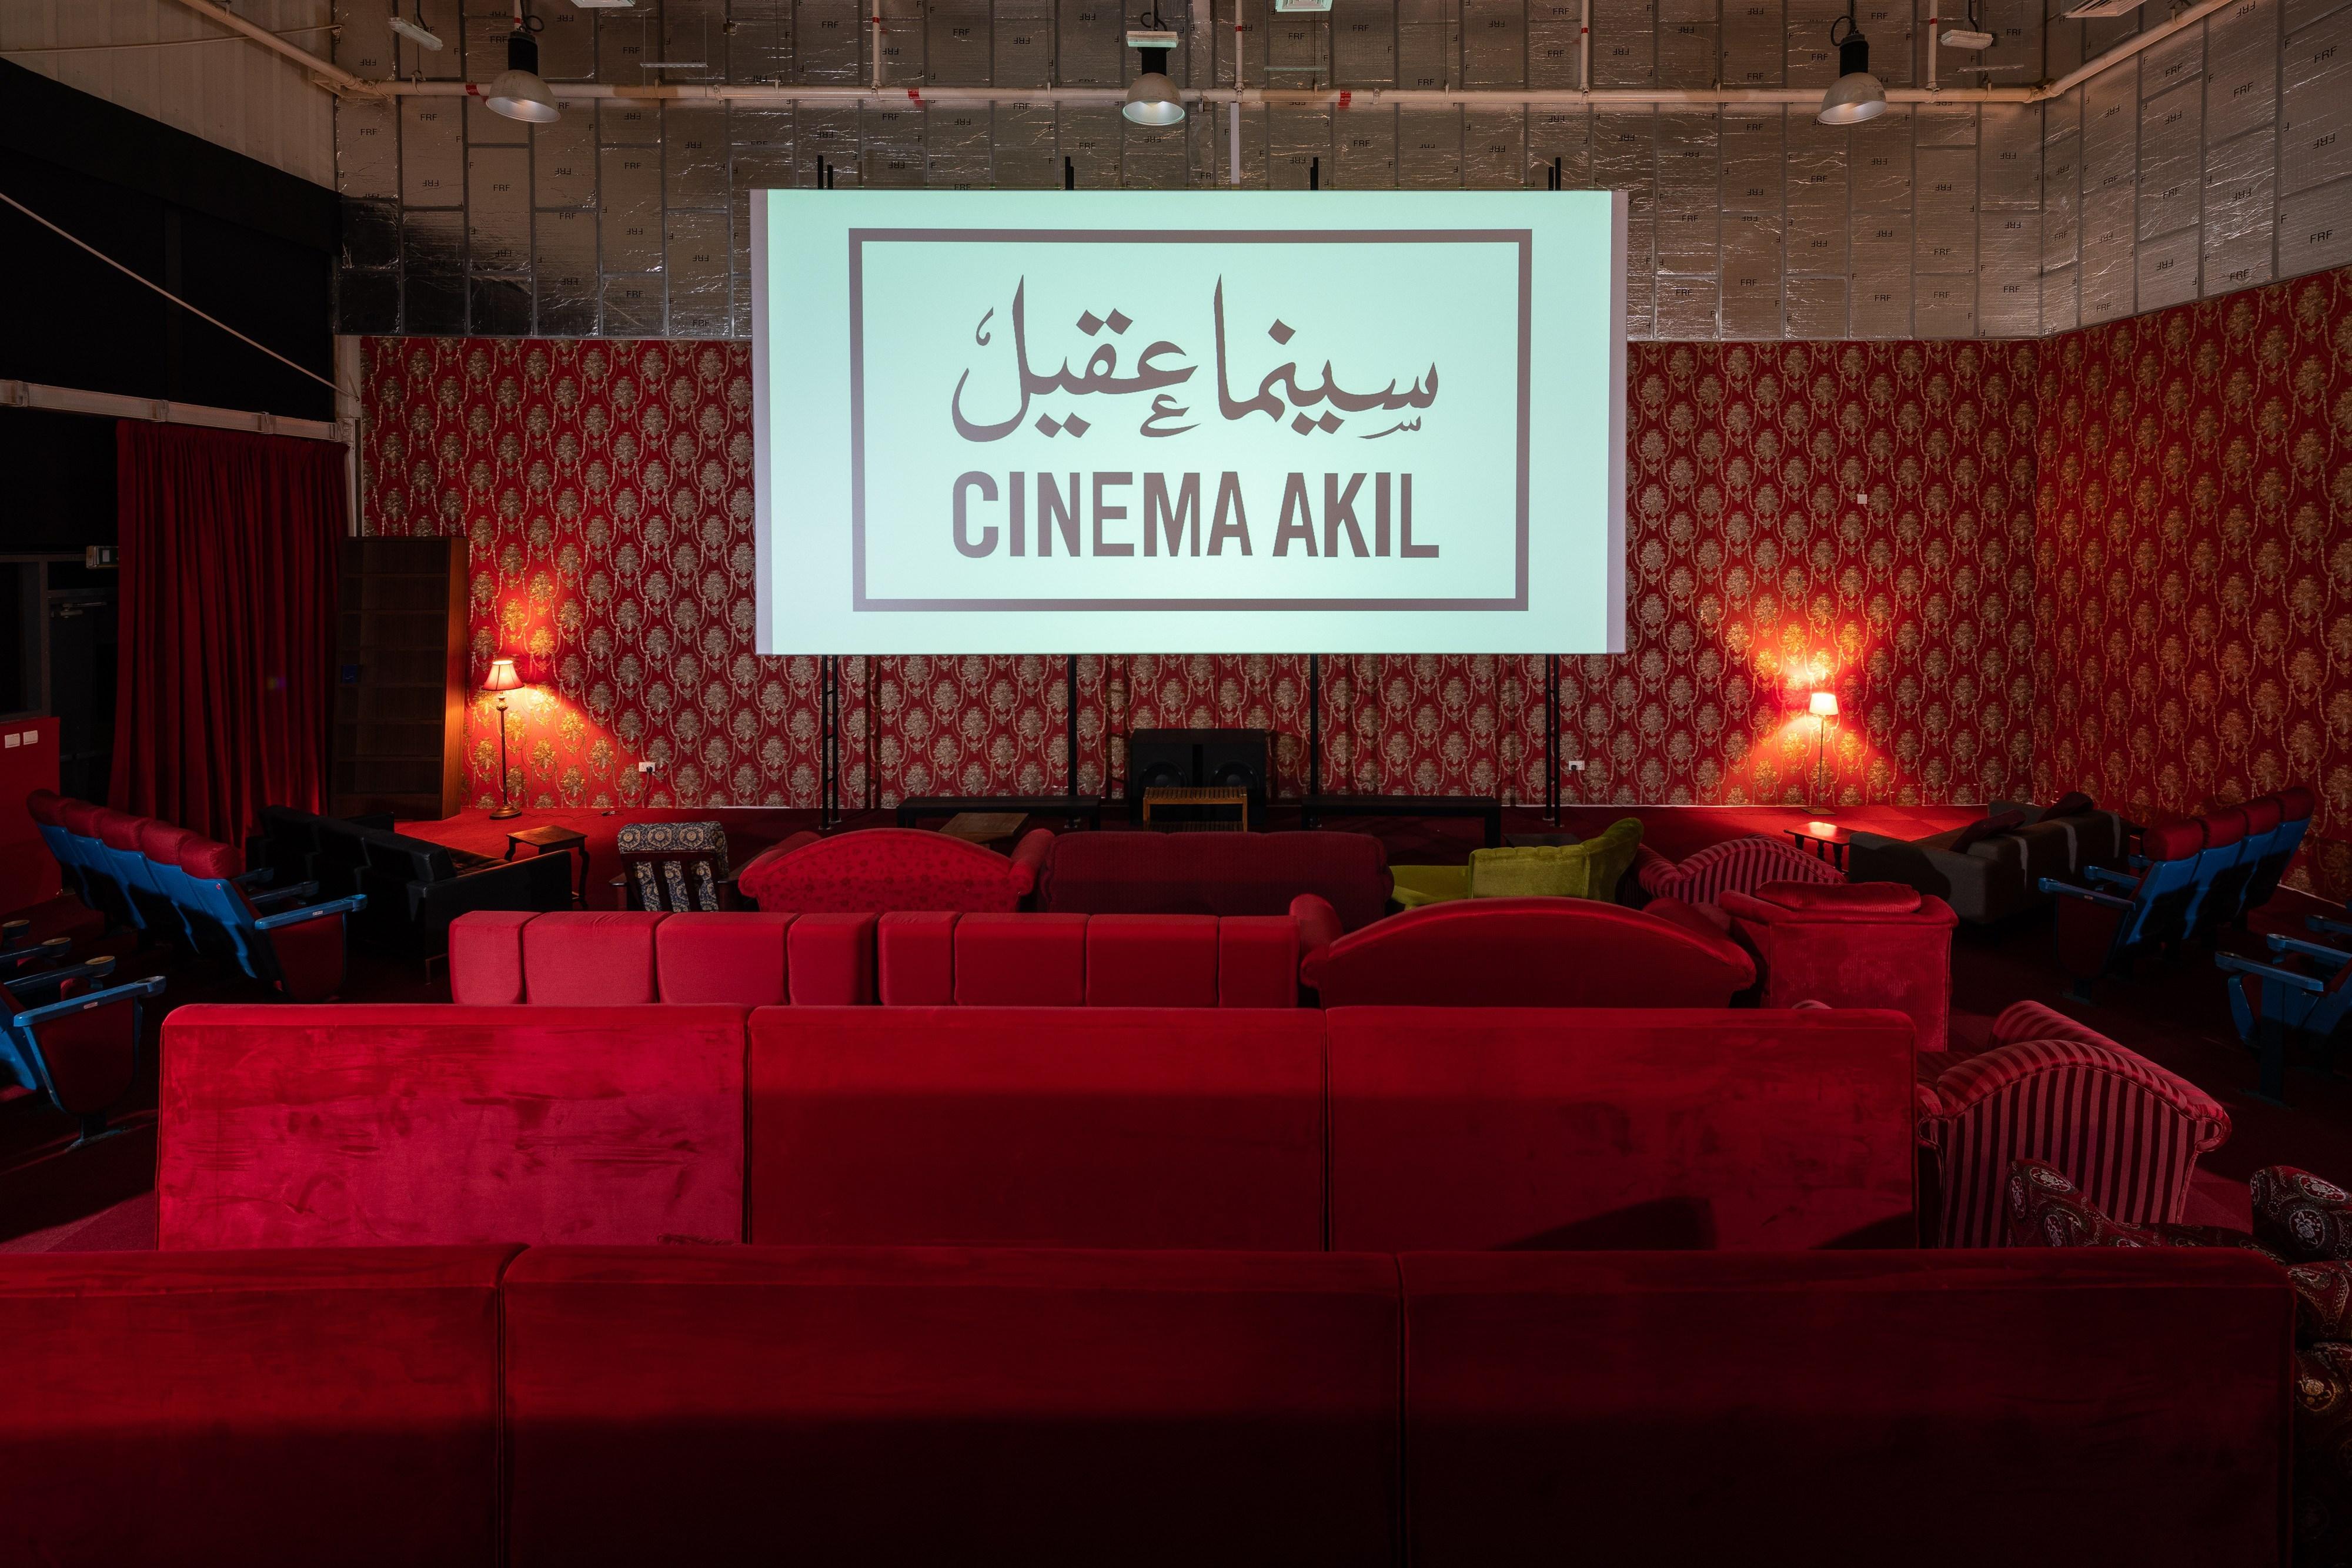 Cinema Akil Online Dubai 2020